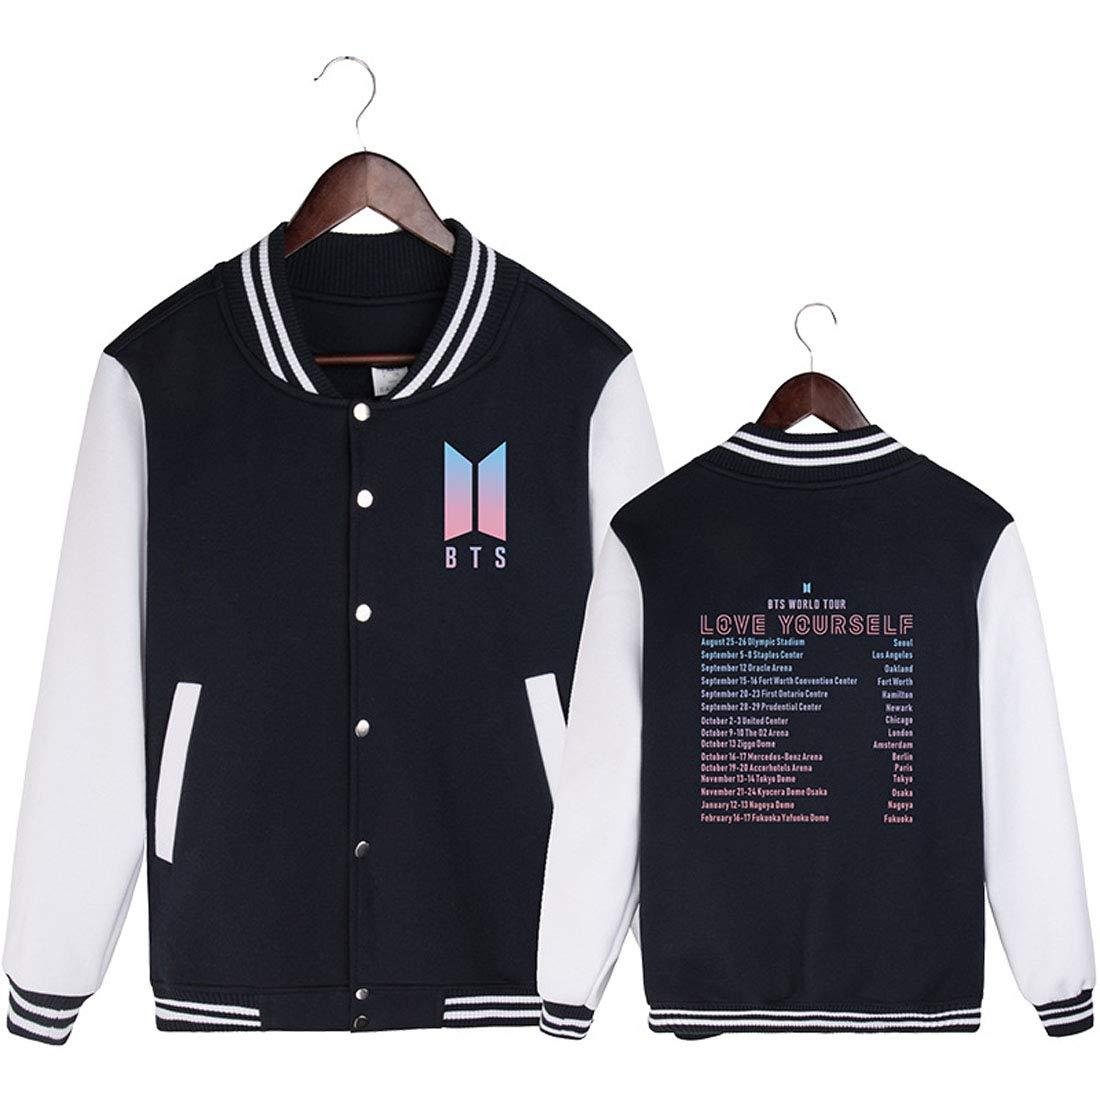 ALLDECOR KpopBTS LOVEYOURSELF Fanmade Baseball Uniform Hoodie Thick Jacket Coat